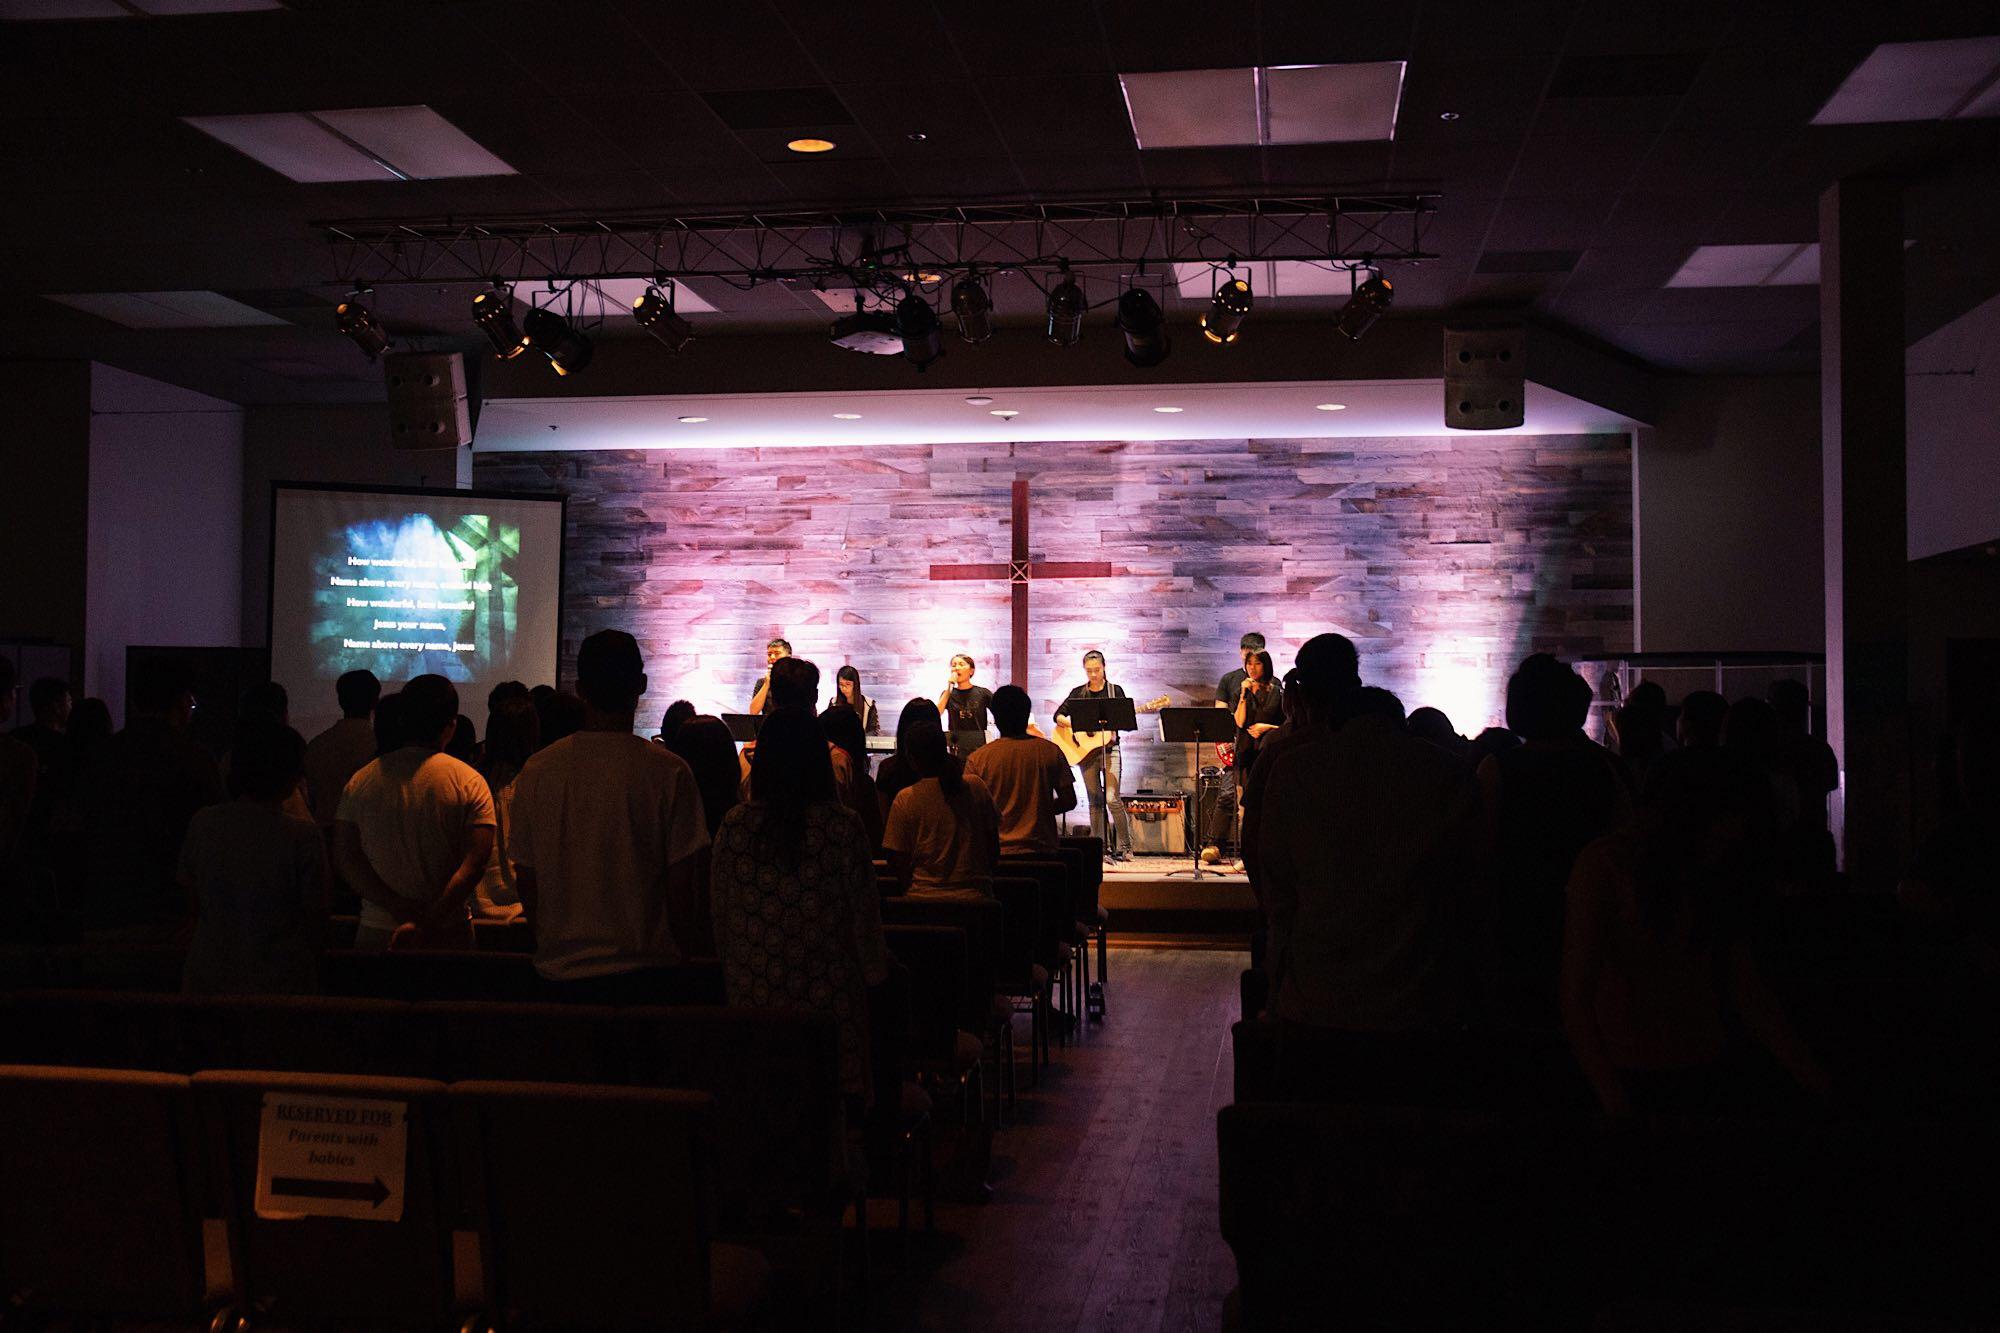 Congregation worshiping God